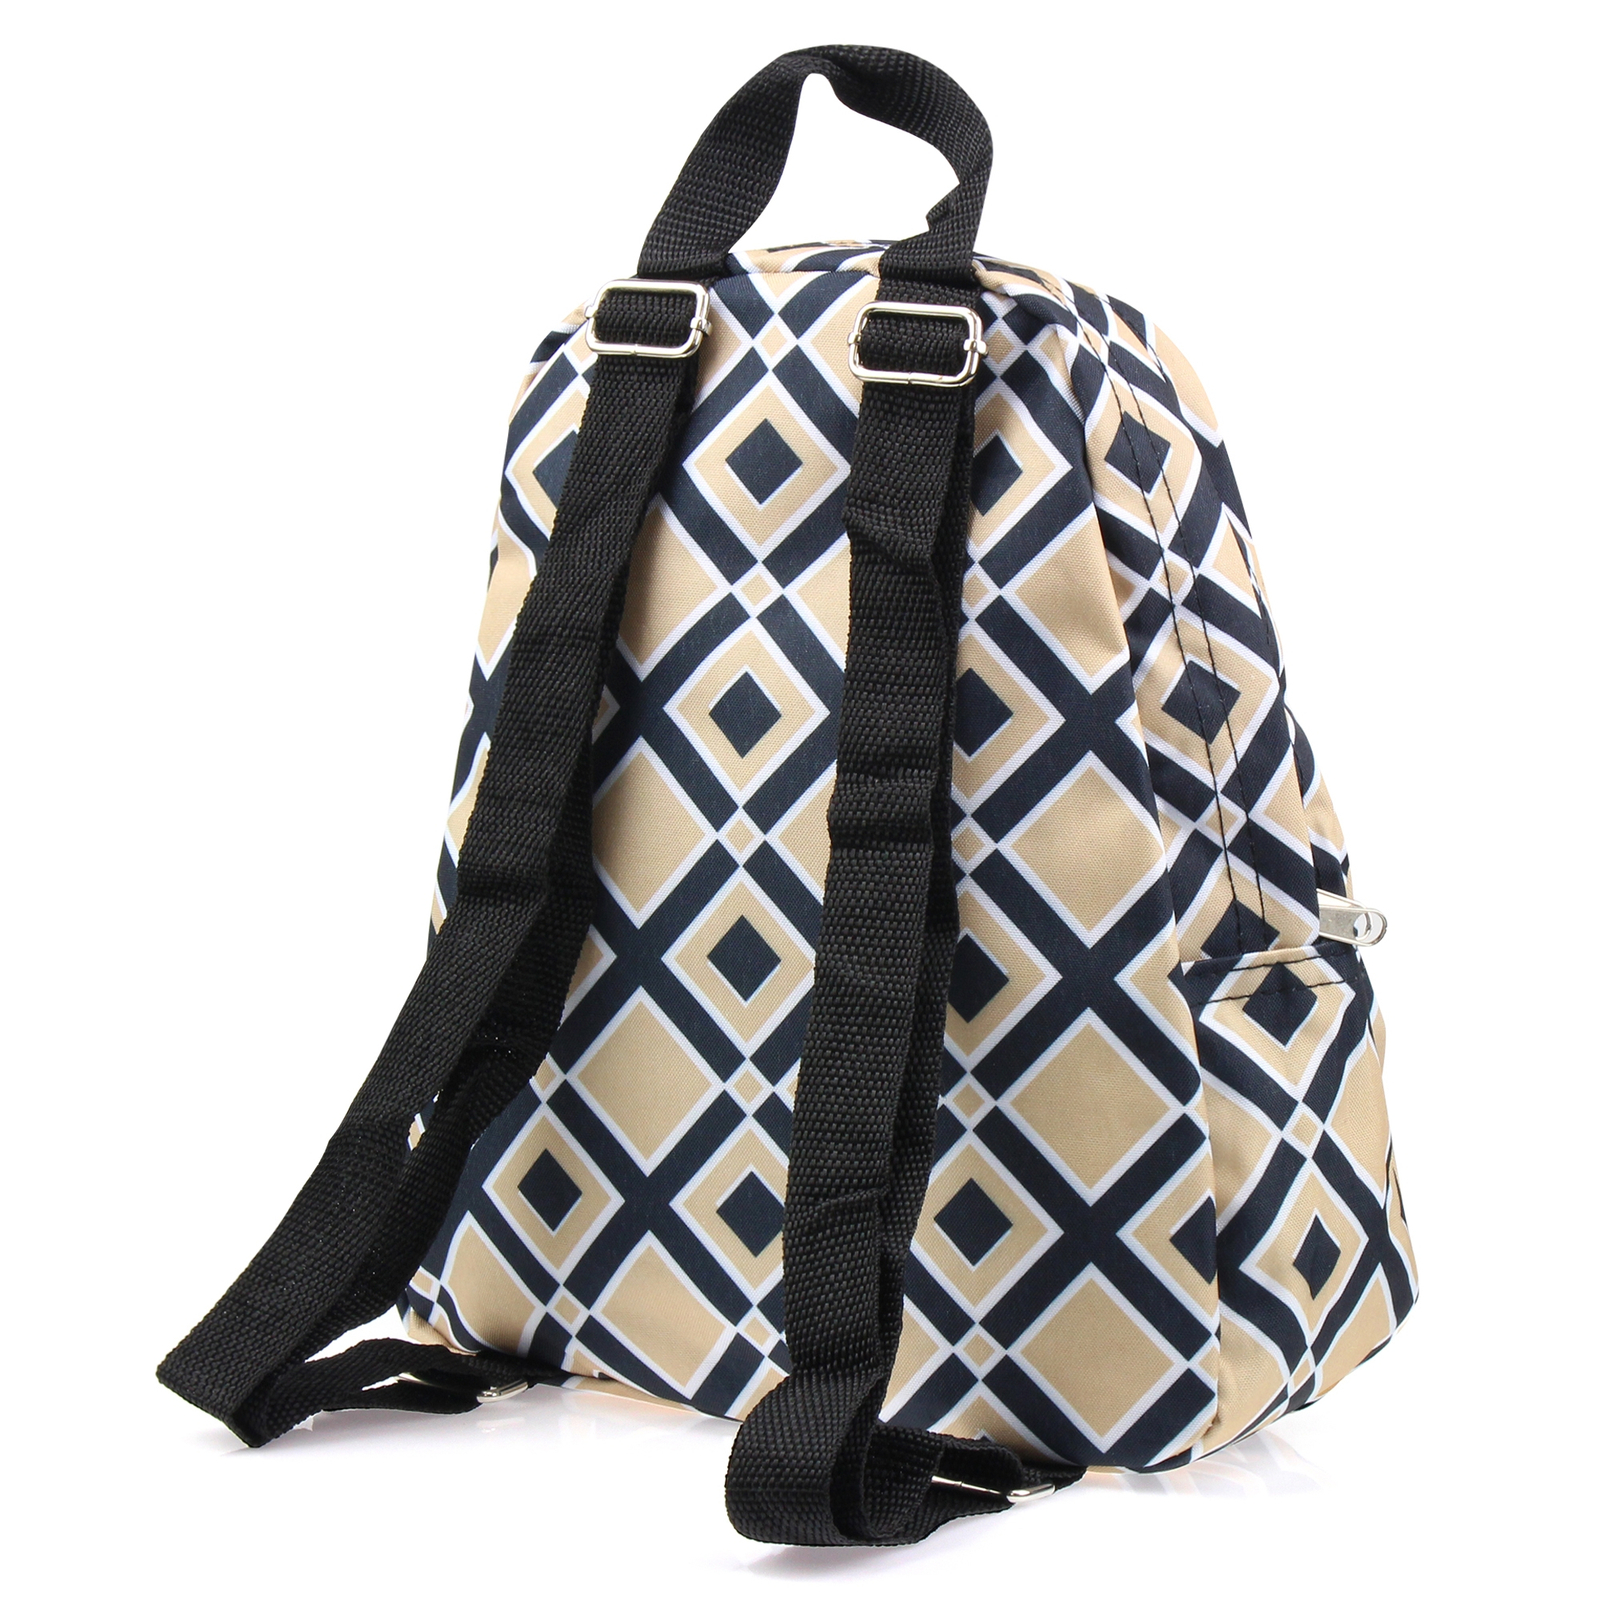 b8508f1ae765 Zodaca Stylish Kids Small Travel Backpack Girls Boys Schoolbag Children s  Bookbag Lunch Bag - Music Note